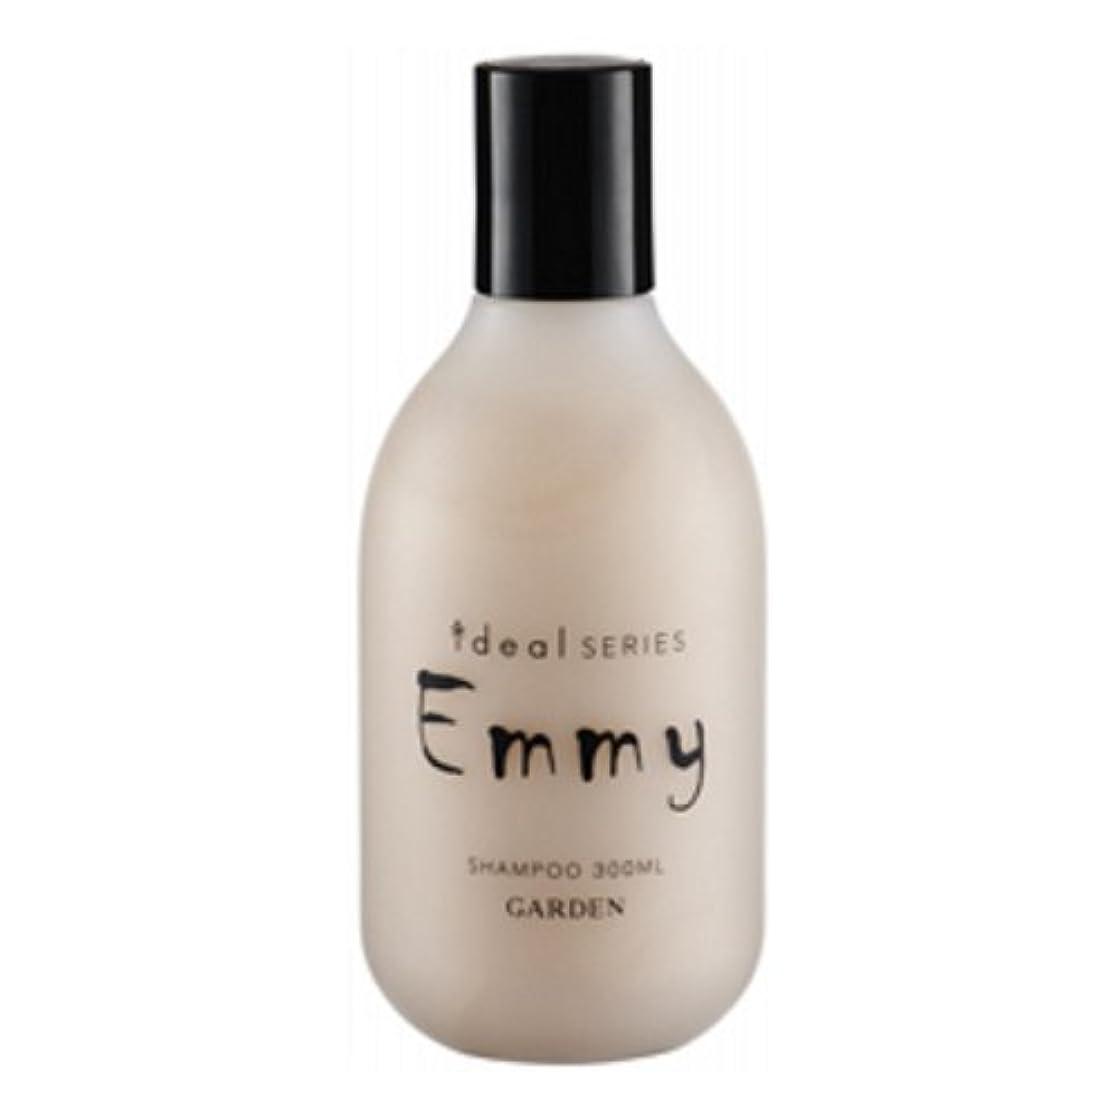 GARDEN ideal SERIES (イデアルシリーズ) Emmy エミー ふんわりベーシックシャンプー 300ml